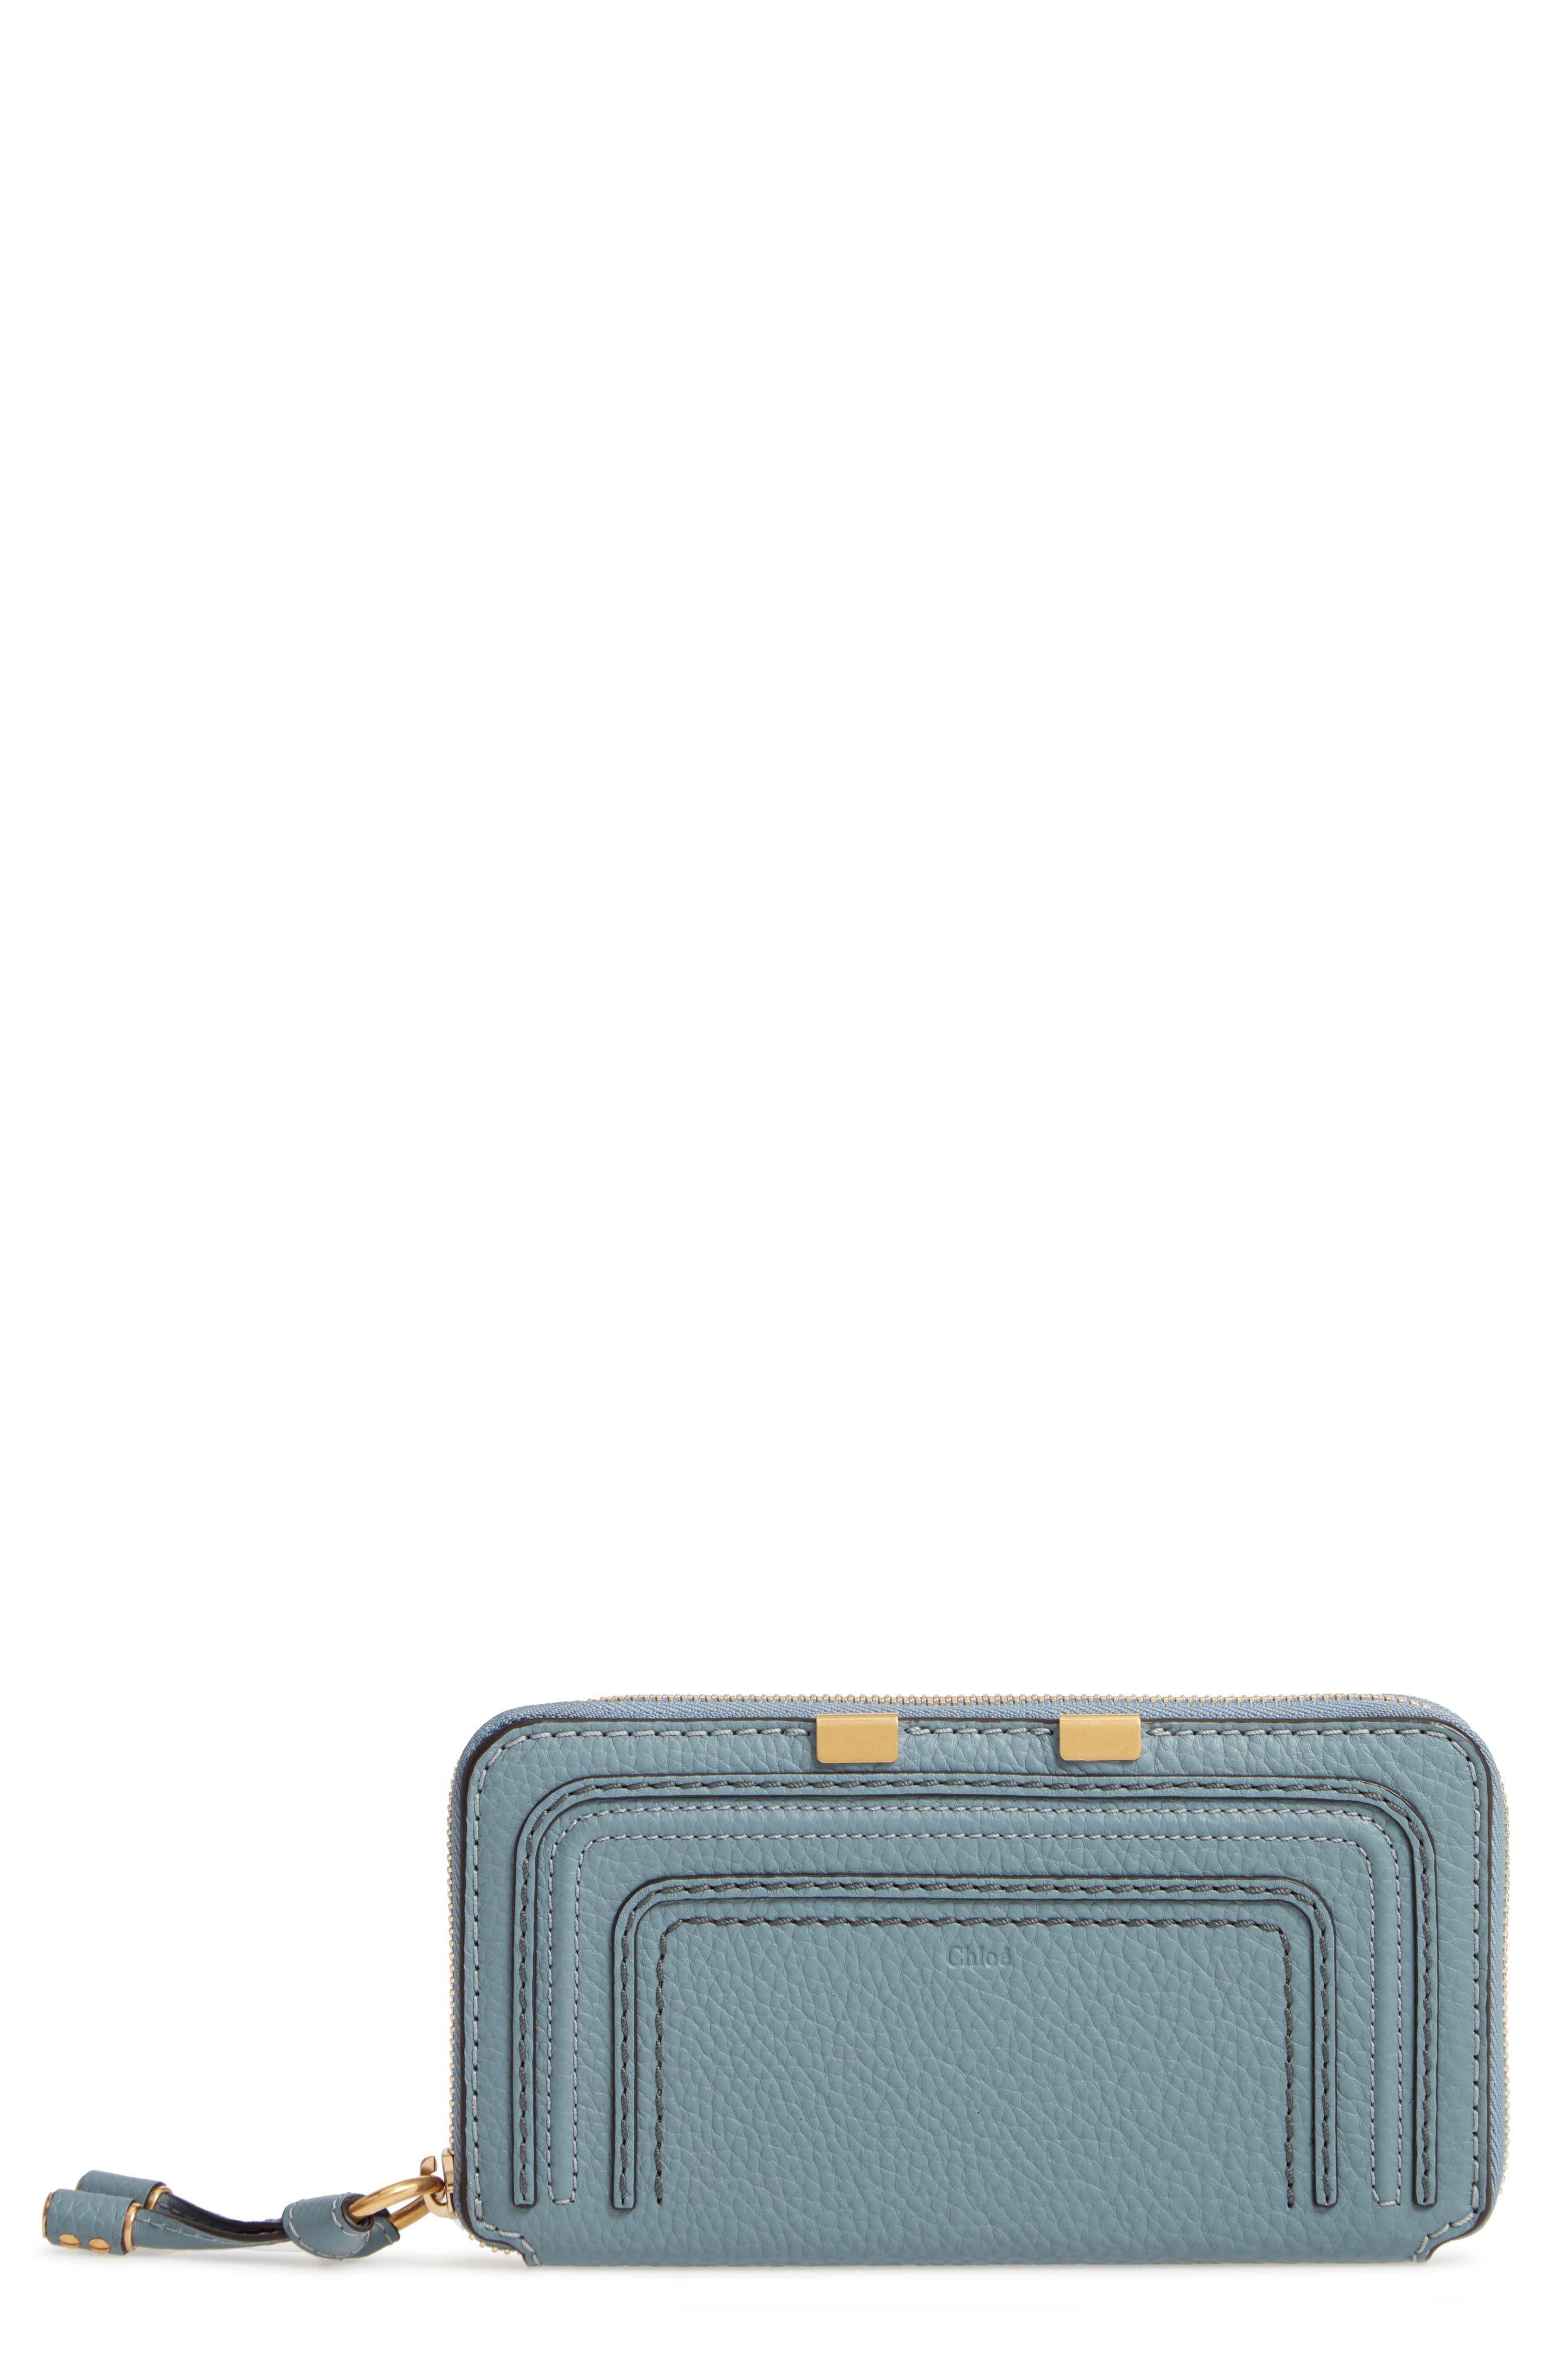 CHLOÉ 'Marcie - Long' Zip Around Wallet, Main, color, CLOUDY BLUE